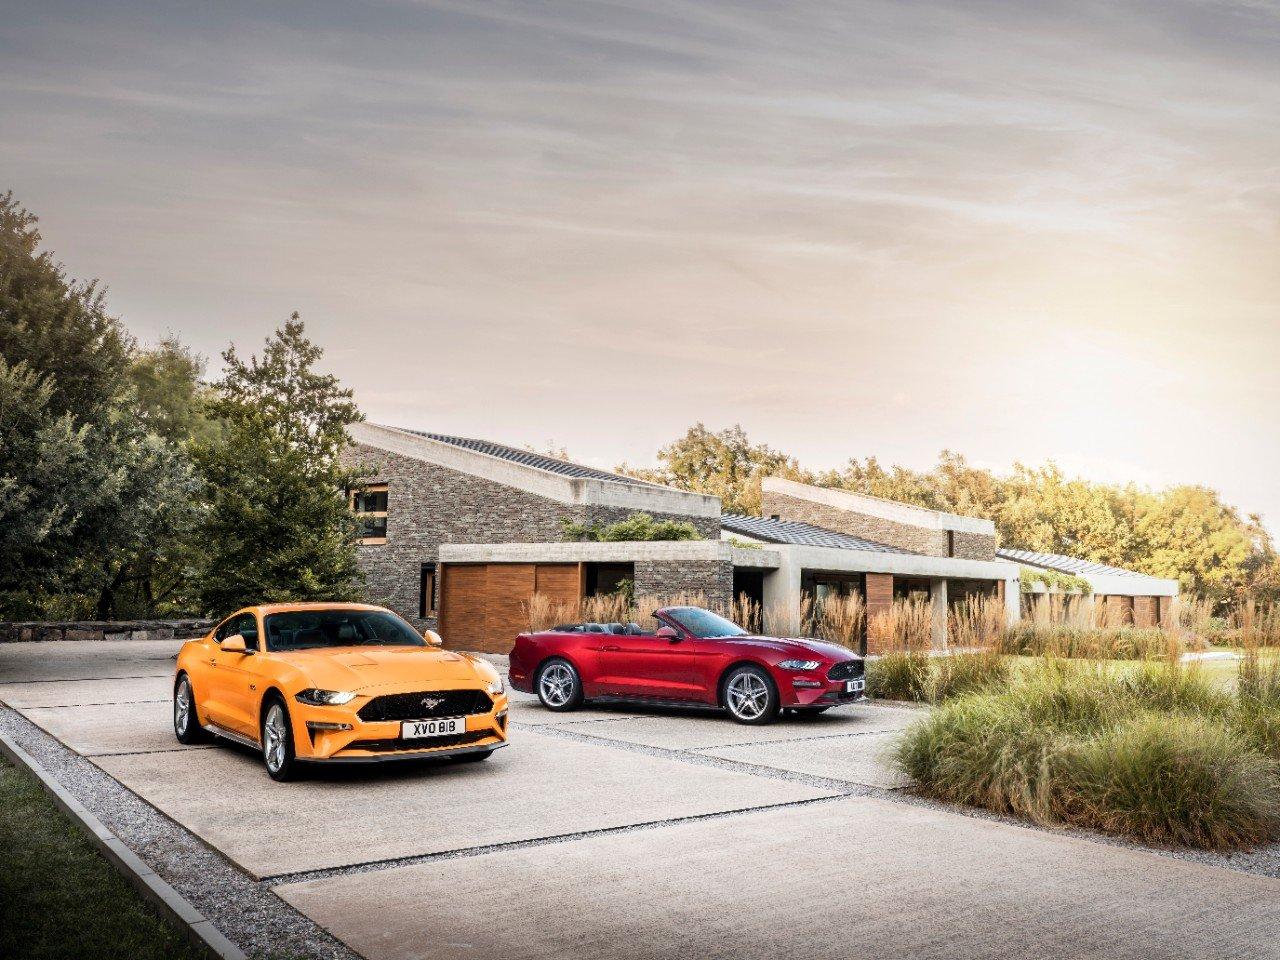 2018 Mustang Makes European Debut